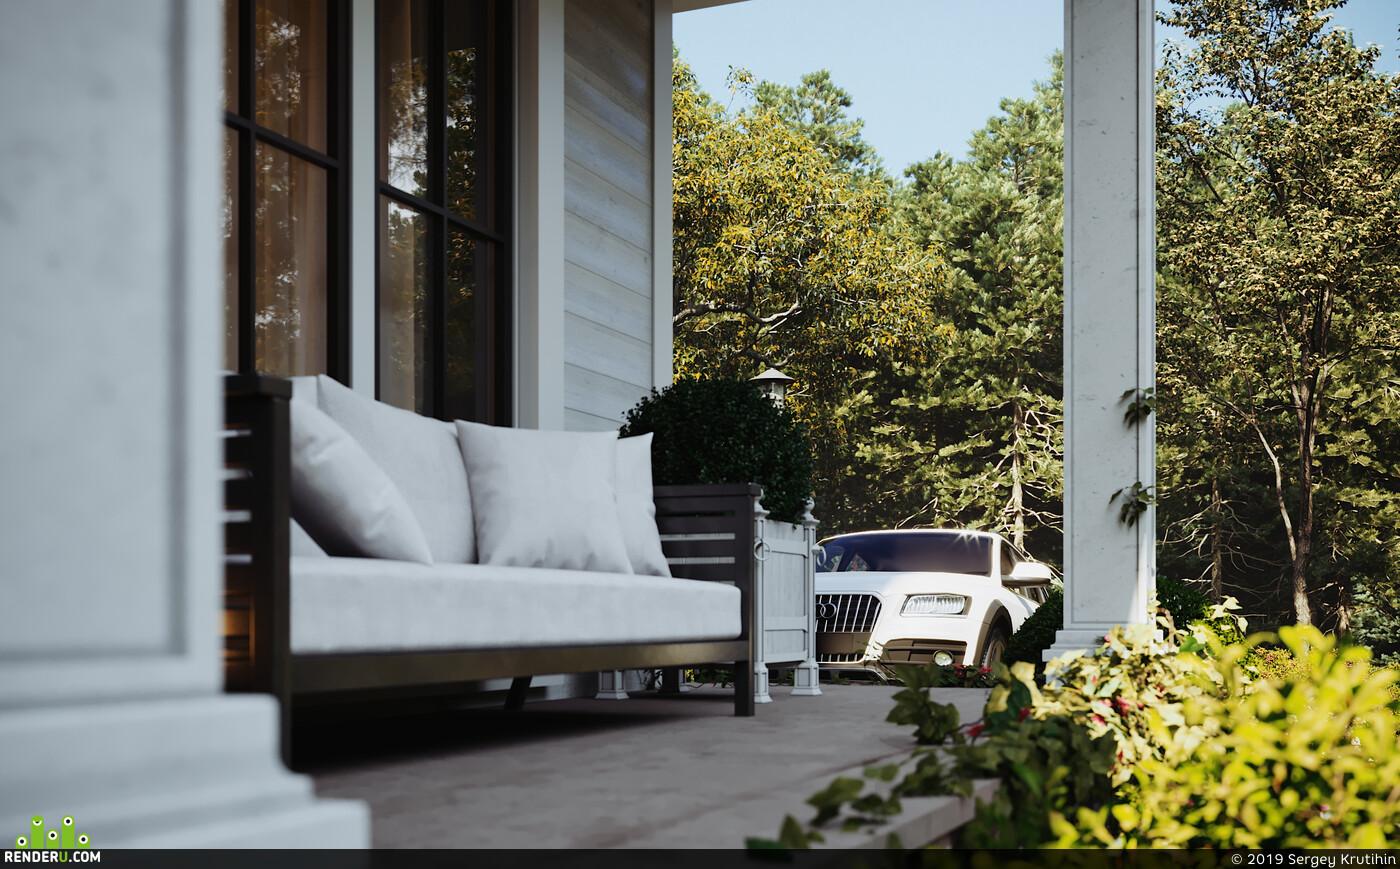 Exterior, 3d exterior, exterior visualisation